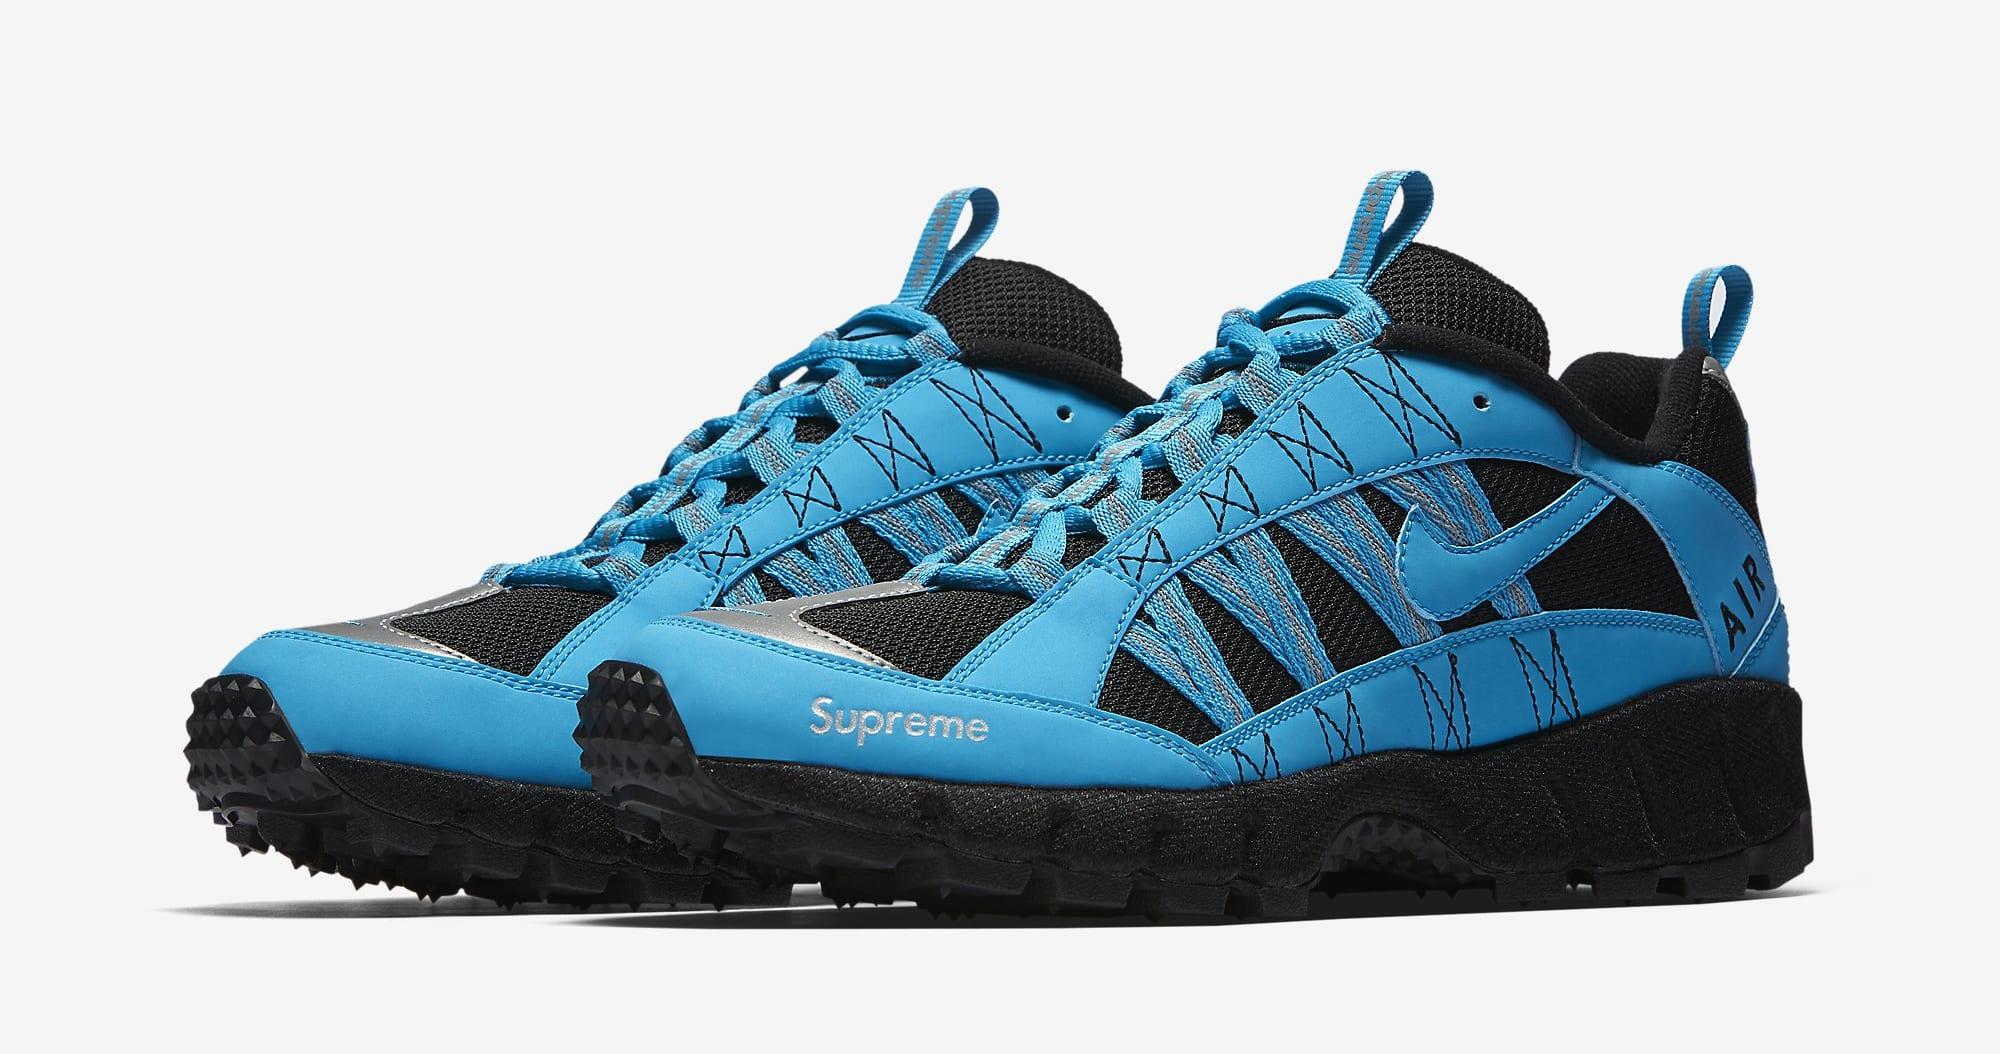 Supreme x Nike Air Humara '17 924464-400 (Pair)